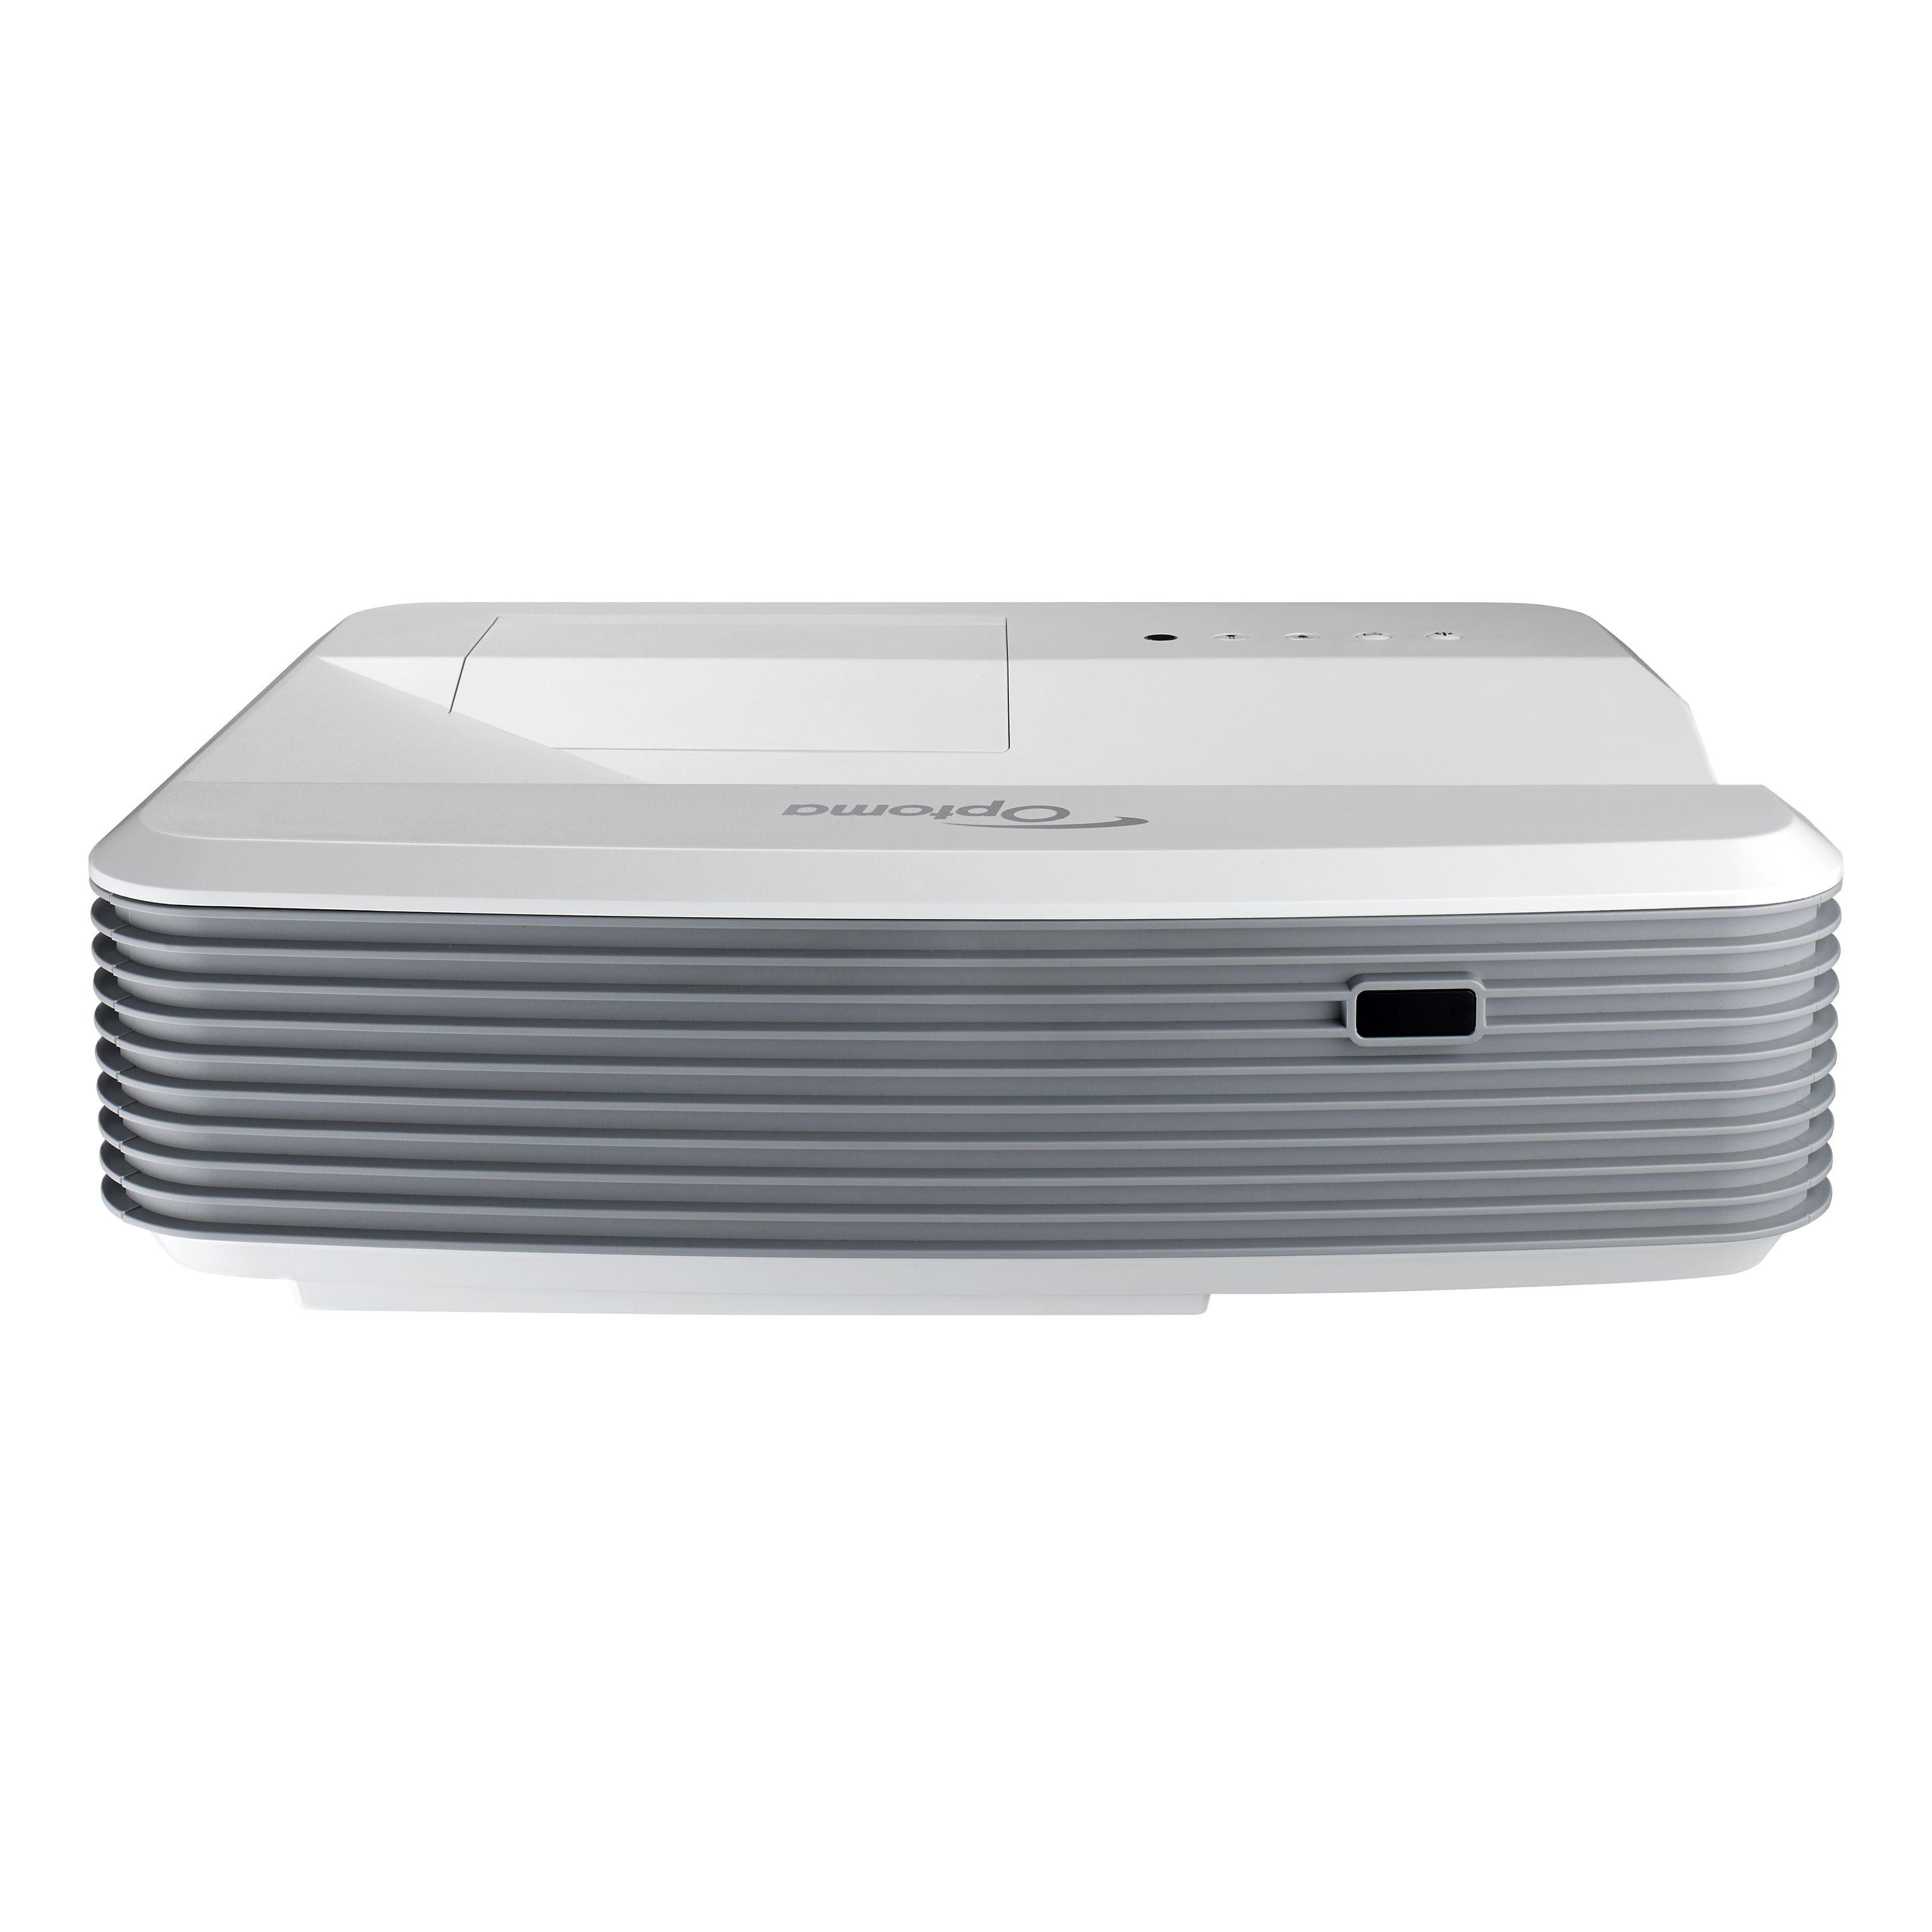 epson eh tw5650 1080p home cinema projector